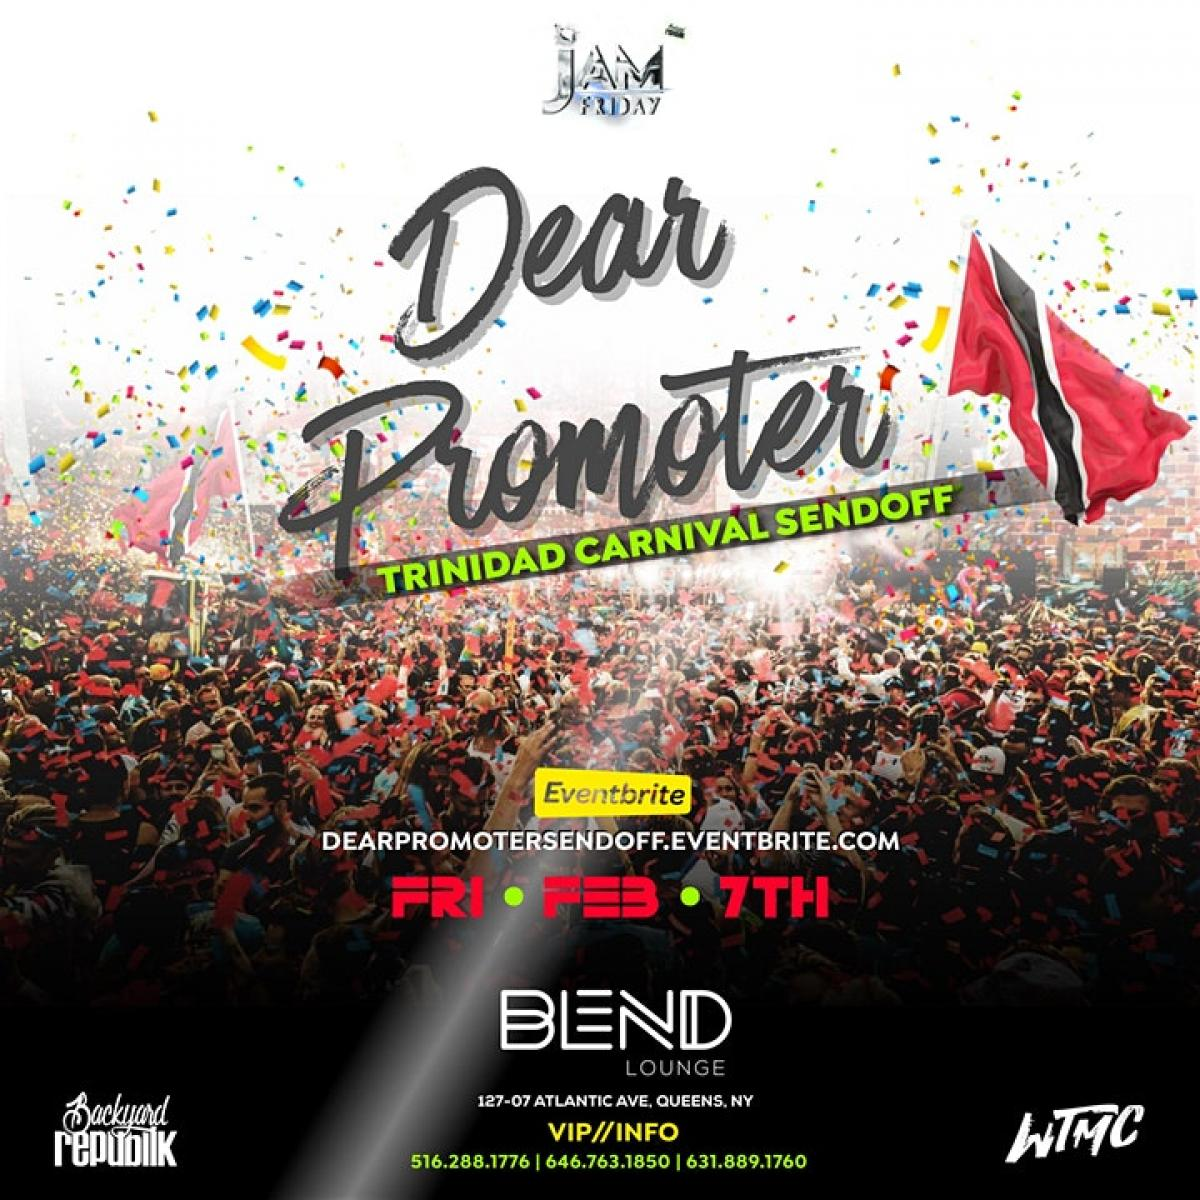 'Dear Promoters' Trinidad Carnival Sendoff flyer or graphic.